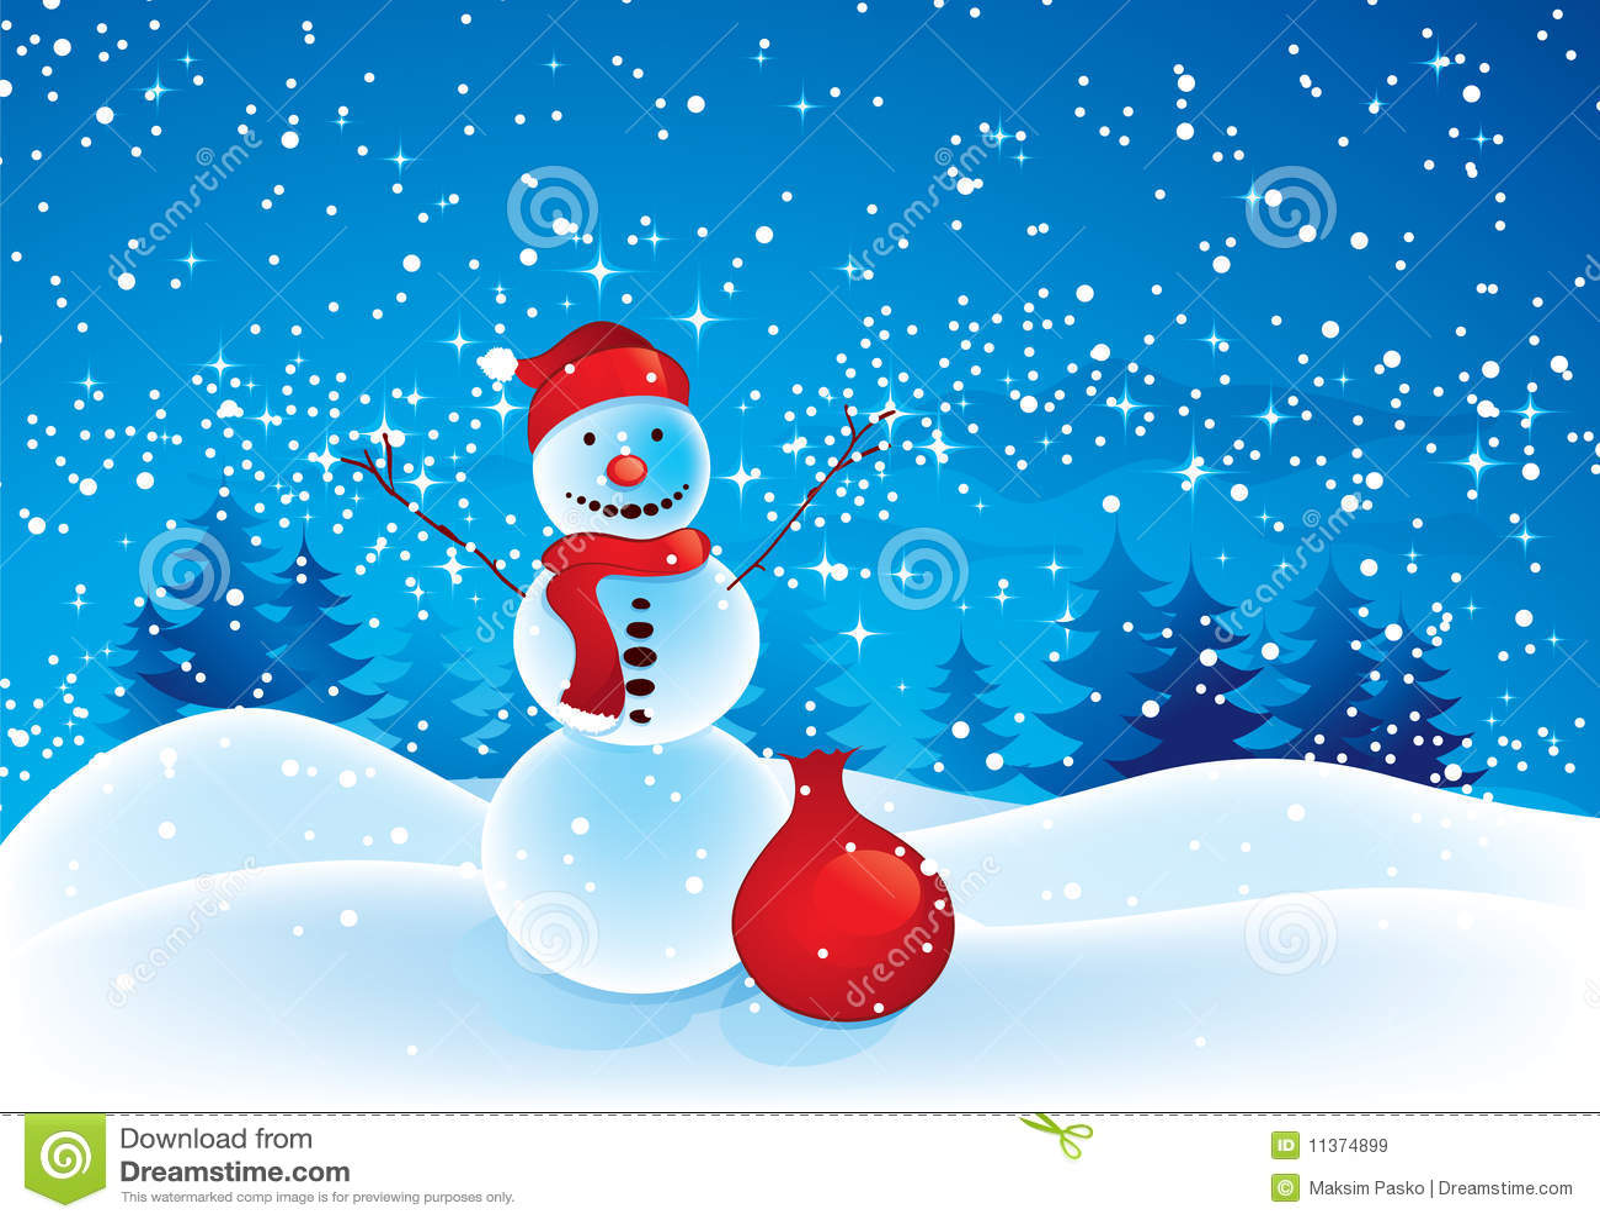 Outdoor Christmas Snowman